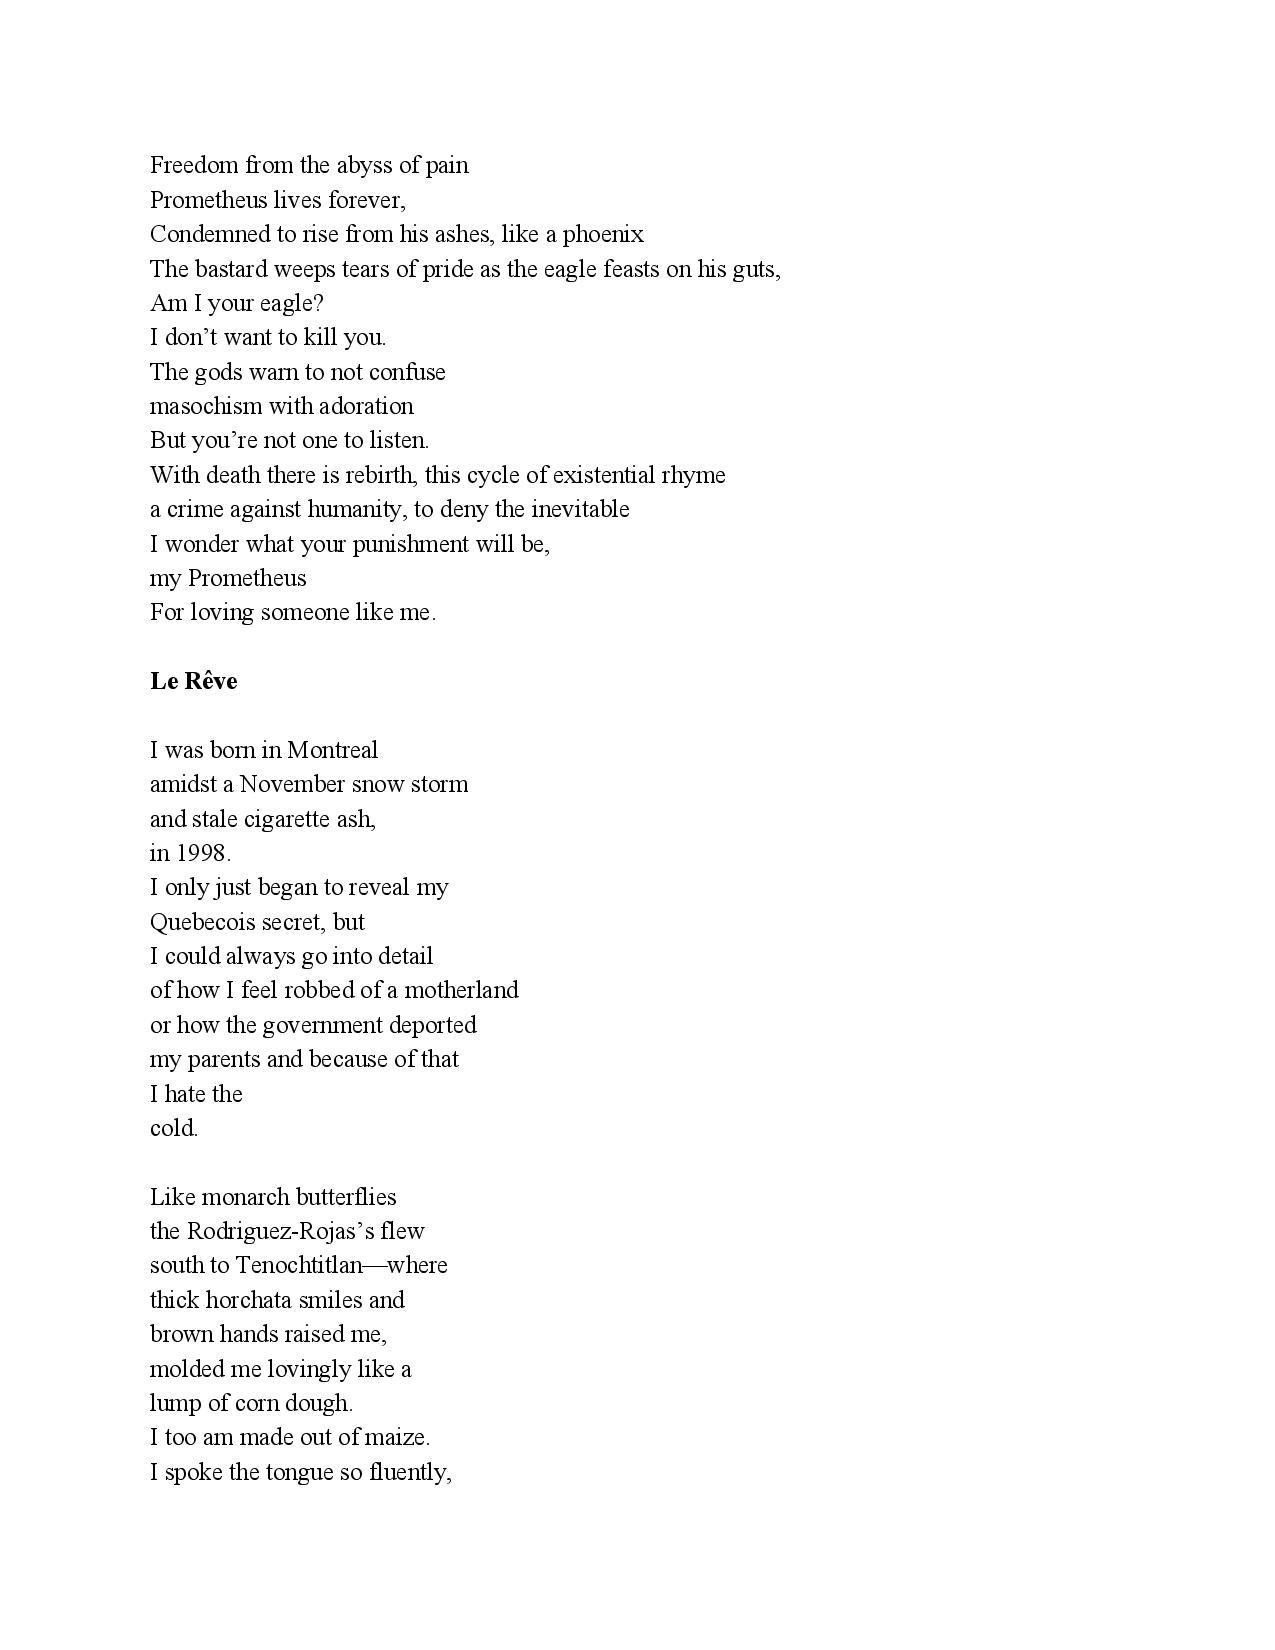 PROMETHEUS II_ Le Reve-page-002.jpg